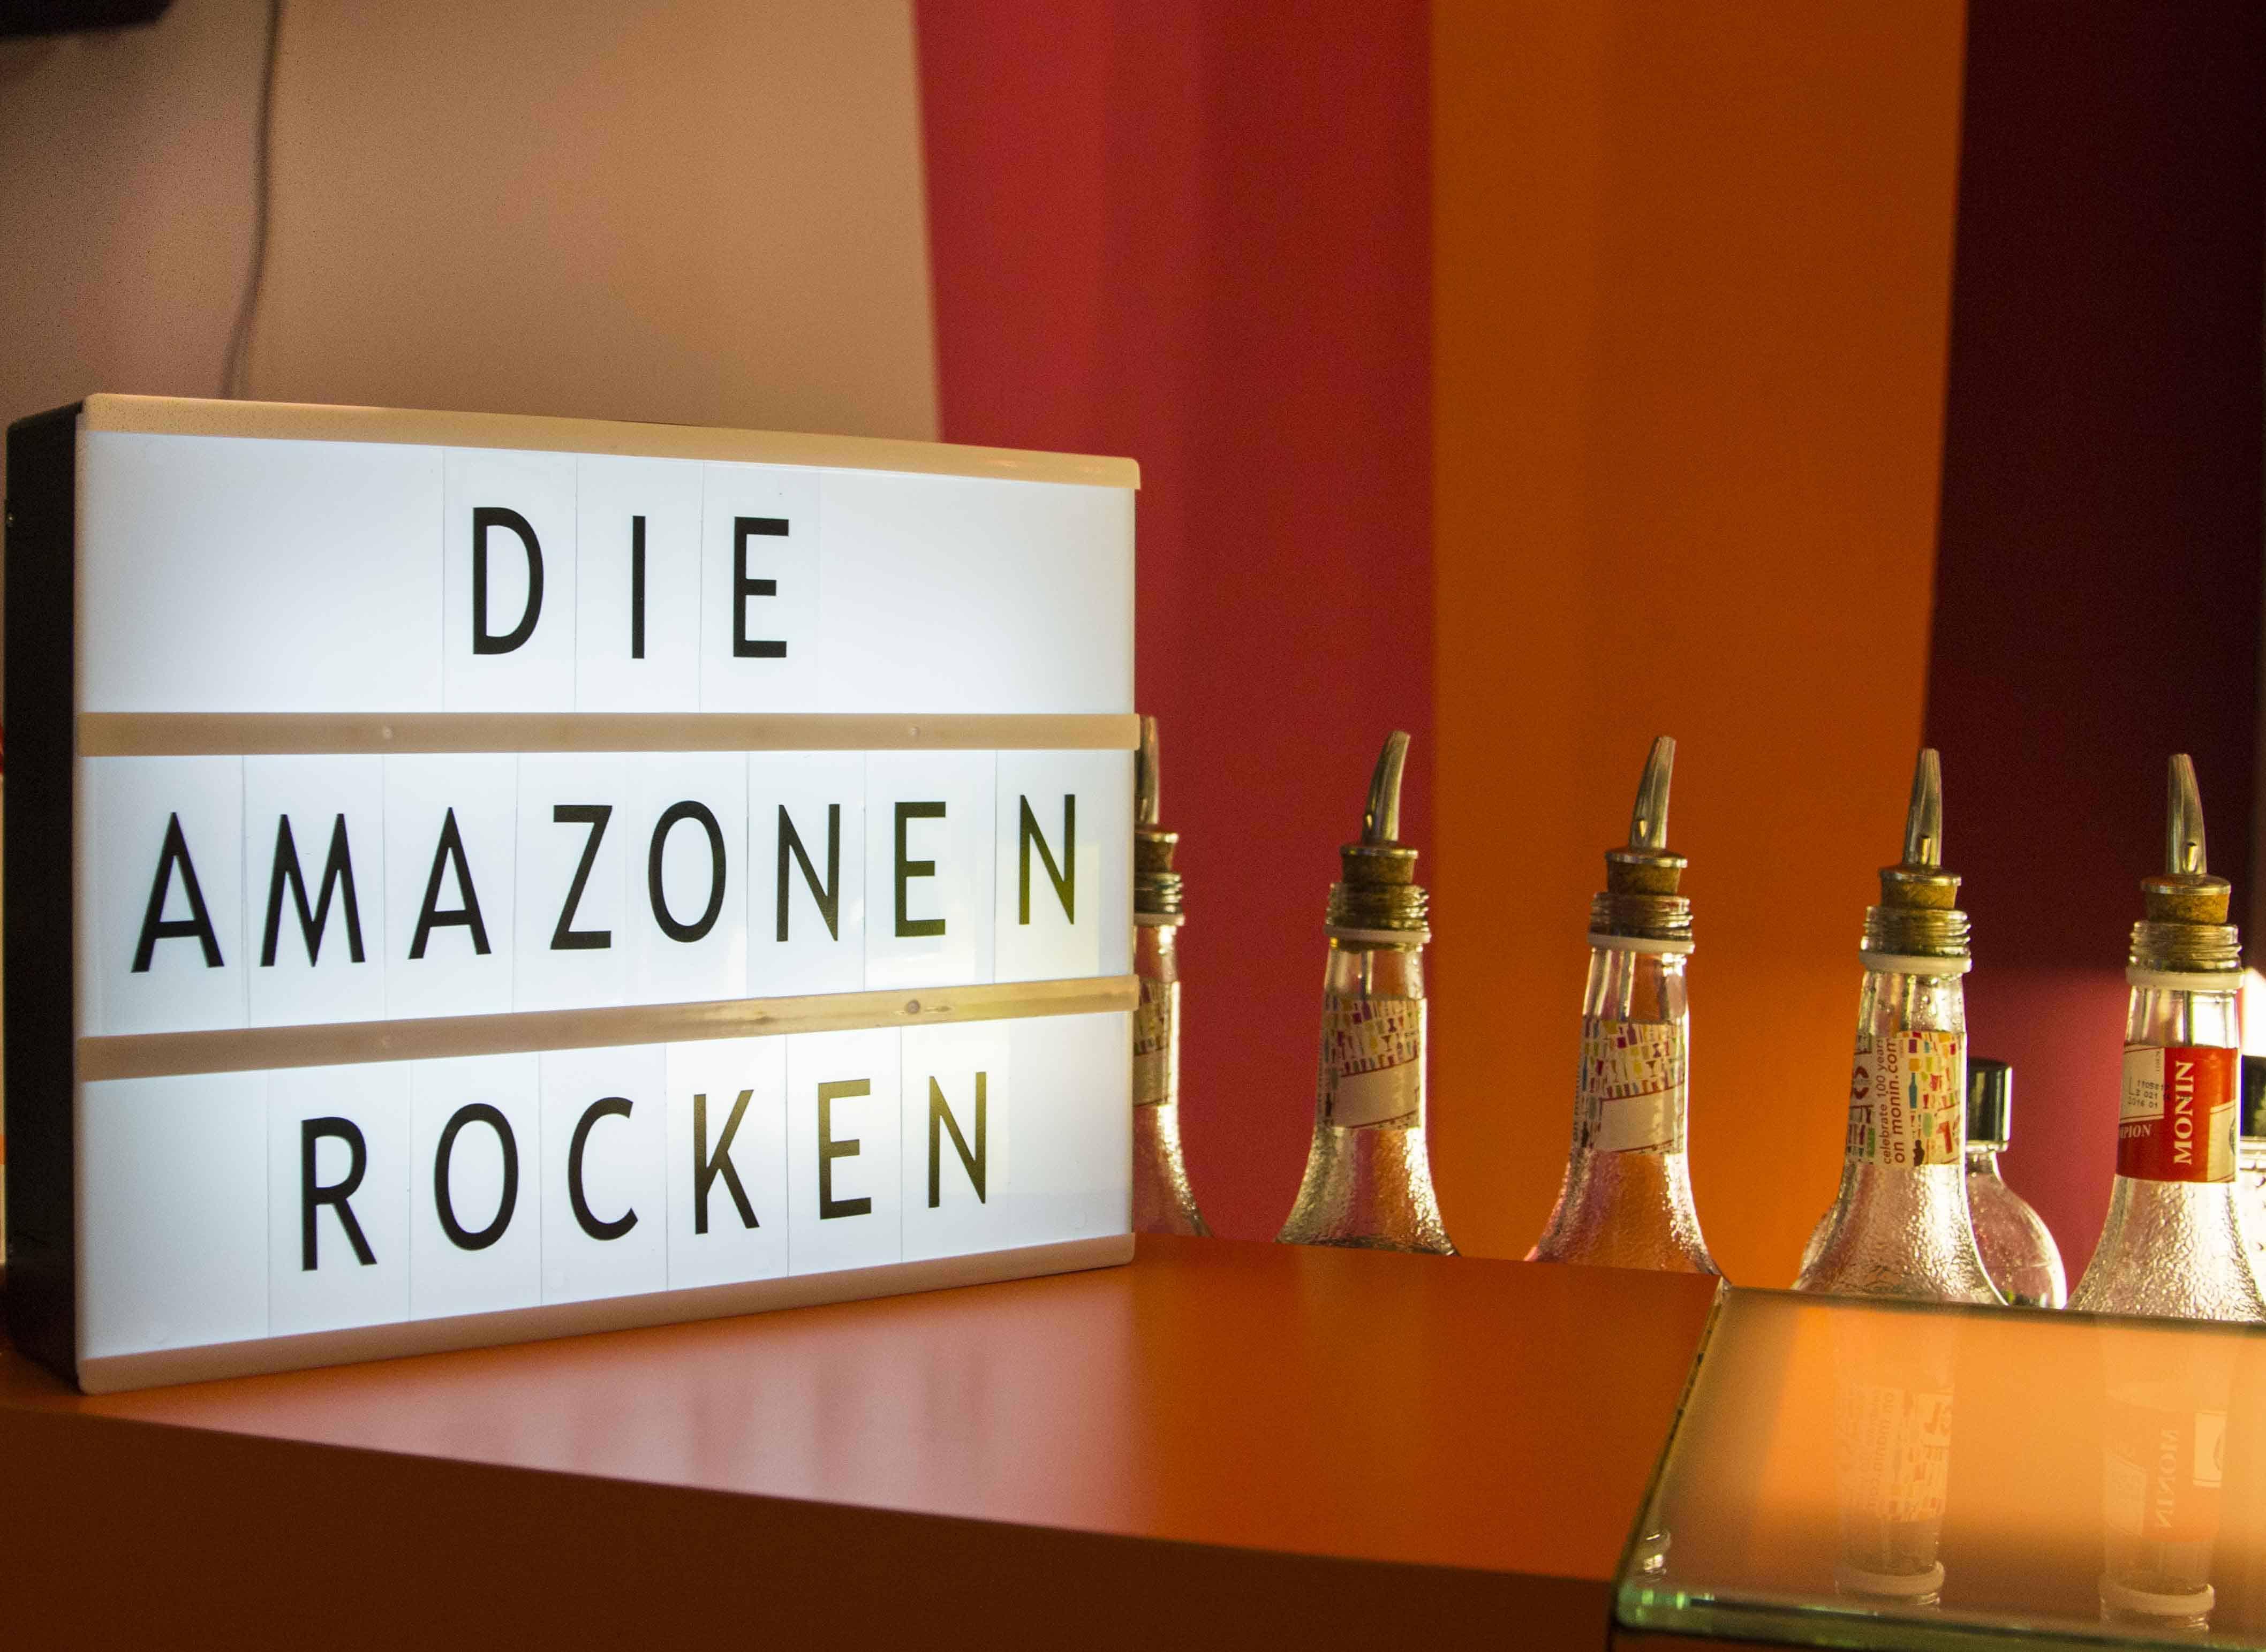 maedchenezentrum2 copyrightPratterNina